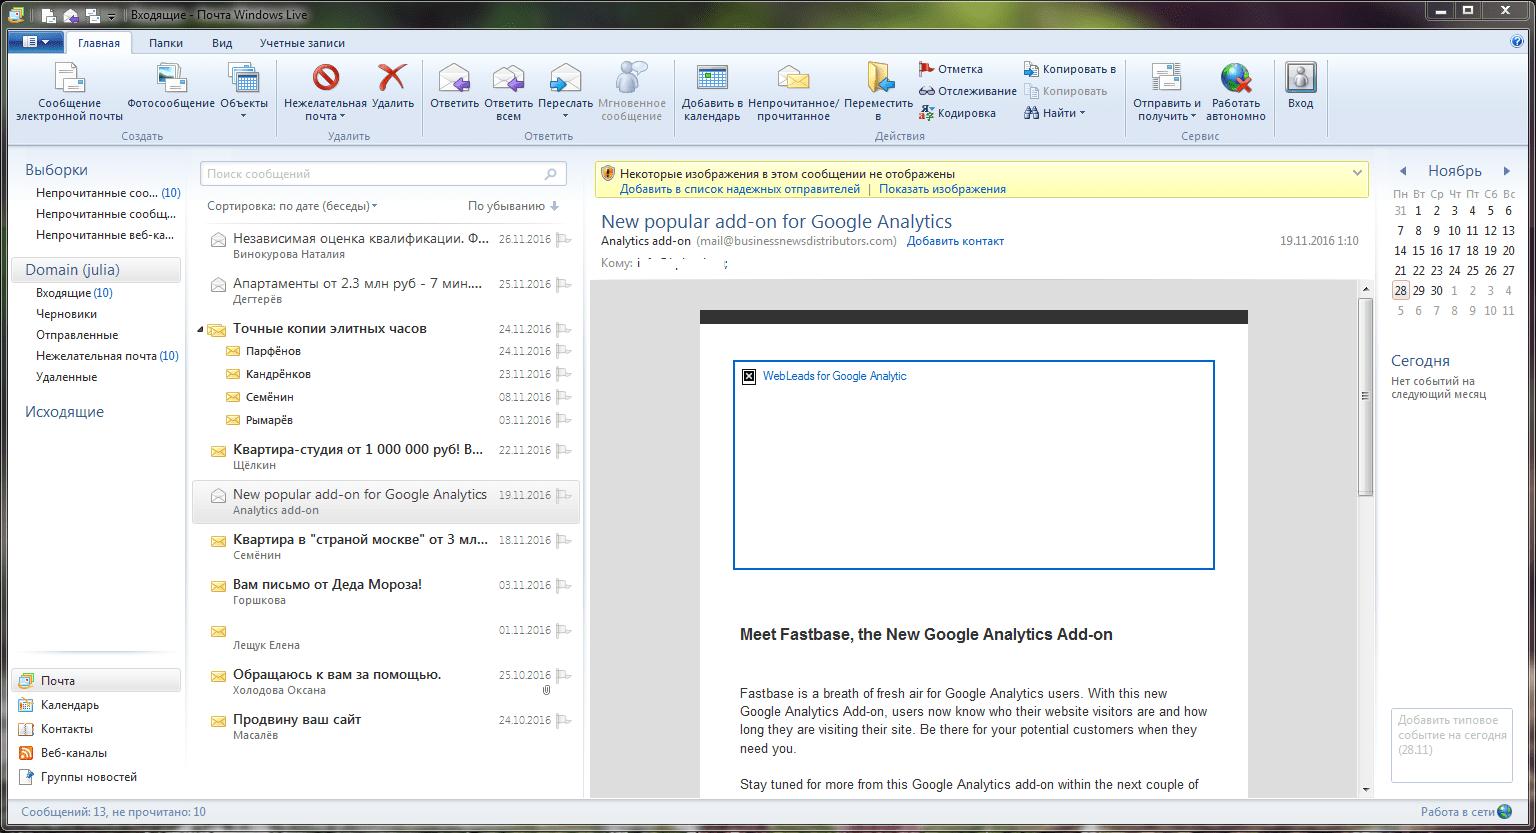 https://webhost1.ru/upload/help/mail/live/2-min.png